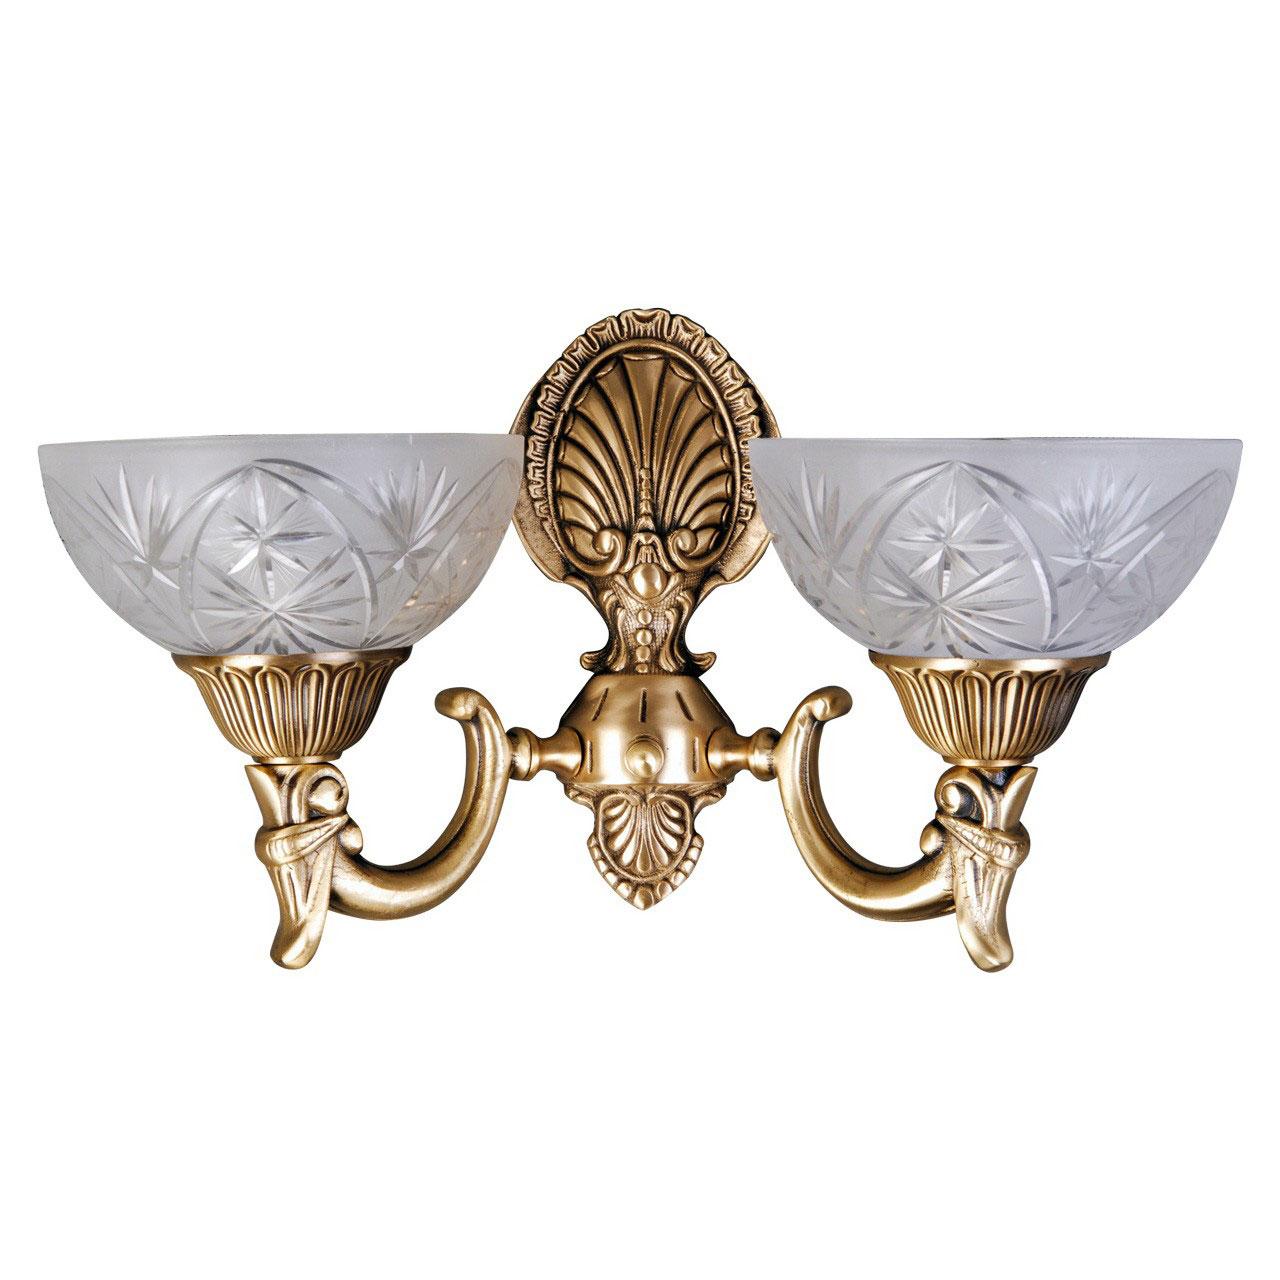 Бра Mw light 317021902 светильник настенный бра 421023901 mw light бра для гостиной бра для спальни для спальни